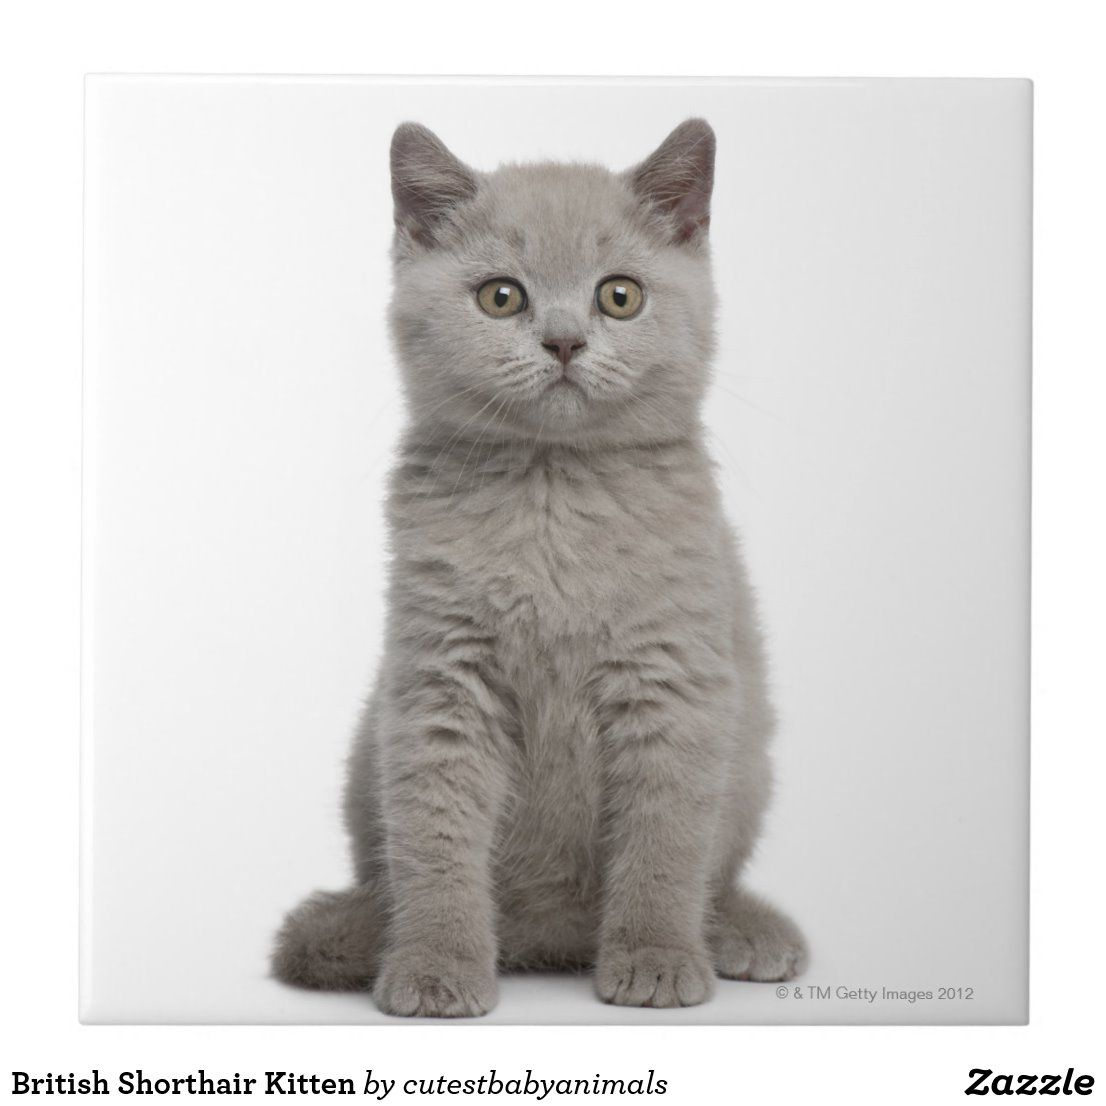 British Shorthair Kitten Tile Zazzle Com In 2020 British Shorthair Kittens British Shorthair Kitten